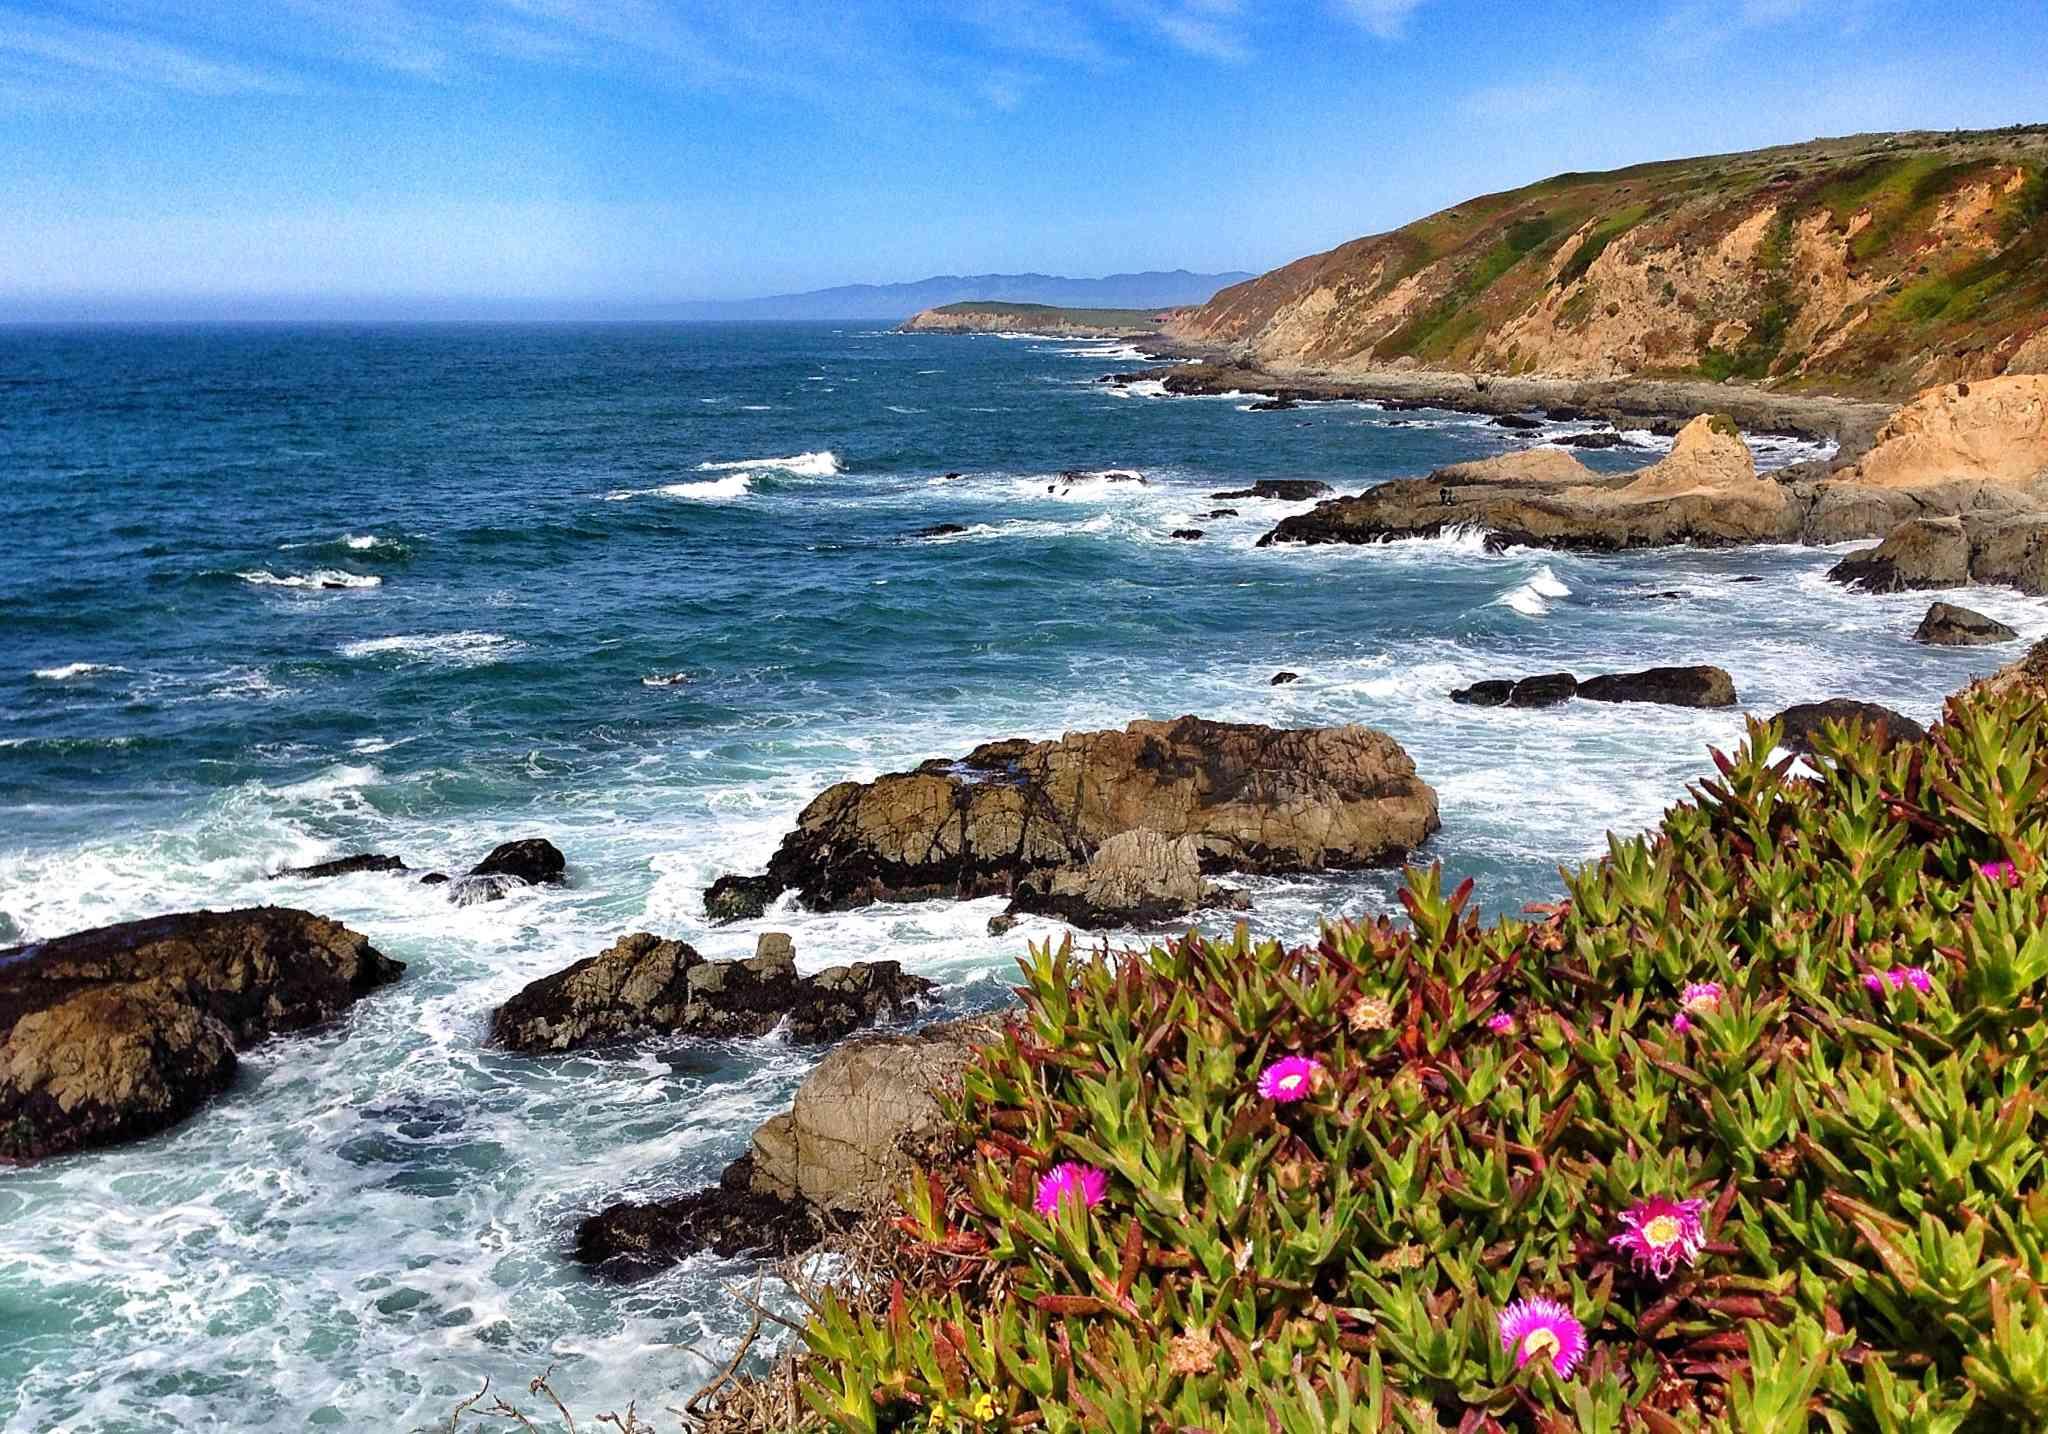 Sonoma Coast from the Bodega Bay Trailhead